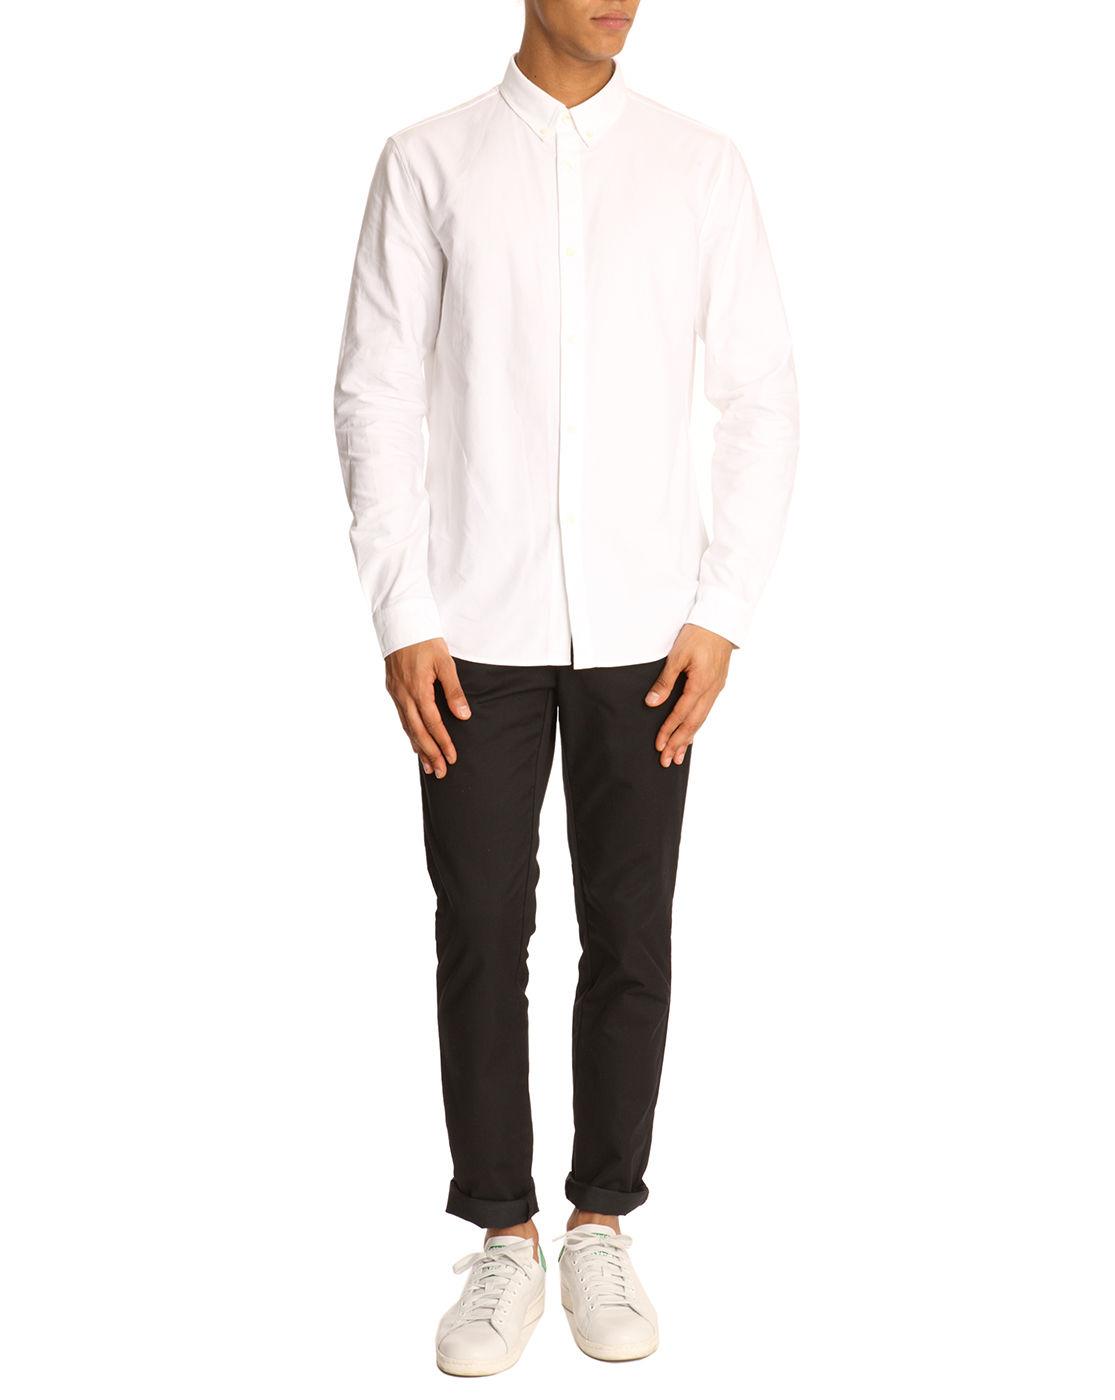 White Oxford Shirt Womens Lookup Beforebuying